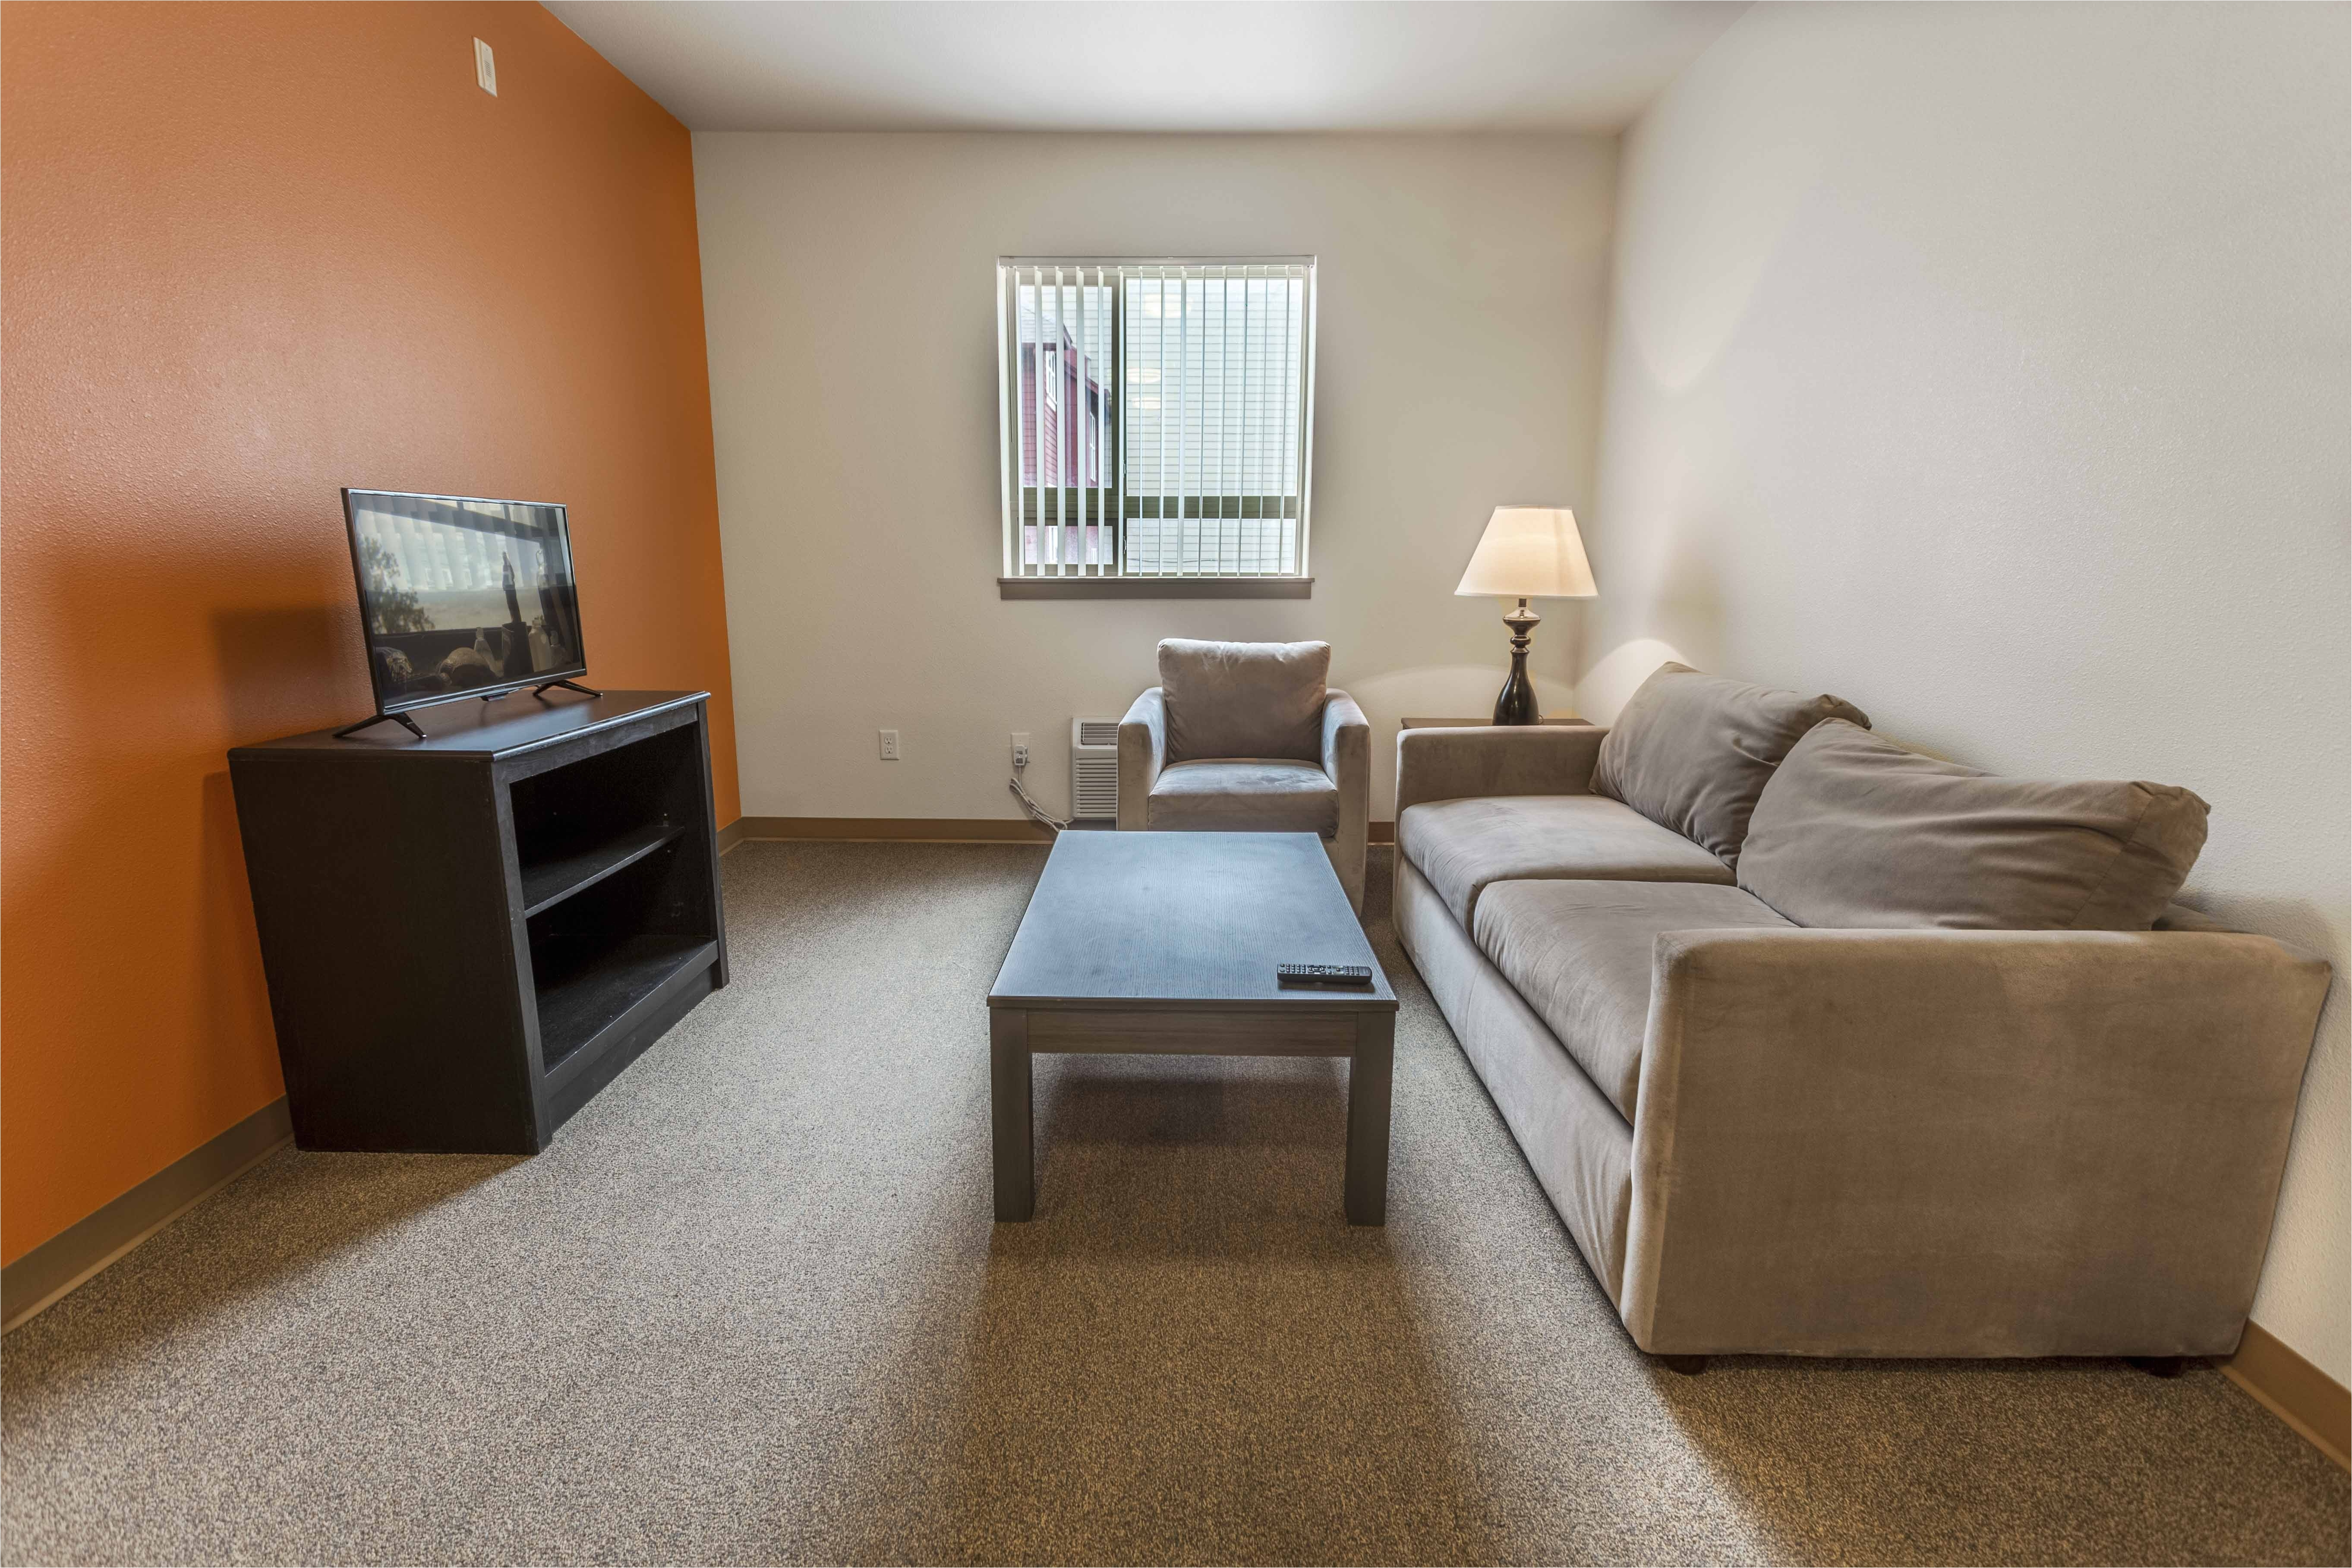 bedroom 50 luxury one bedroom apartments eugene one bedroom apartments eugene fresh westgate eugene or